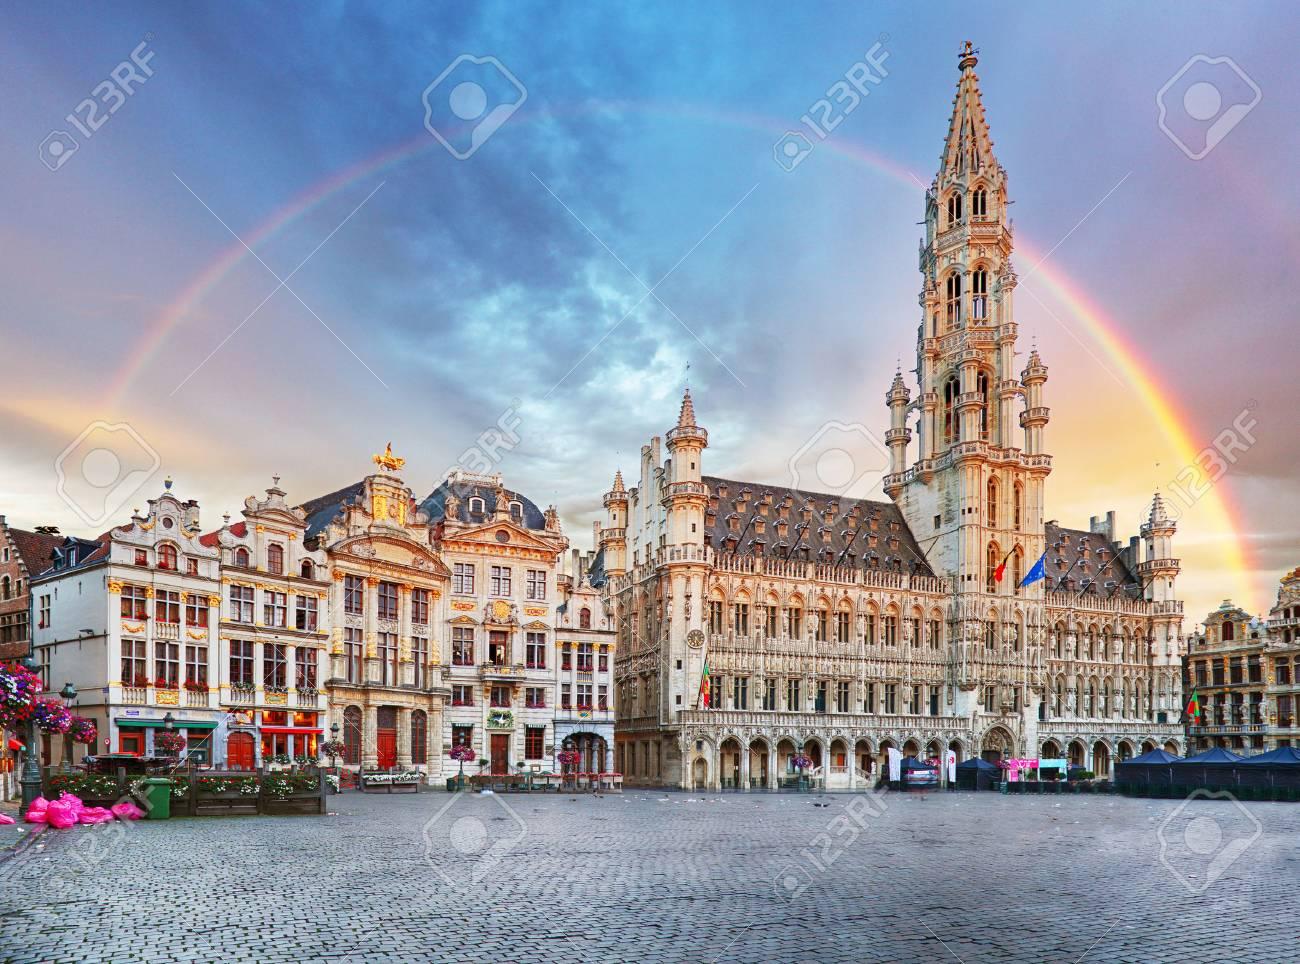 Brussels, rainbow over Grand Place, Belgium, nobody - 85657713